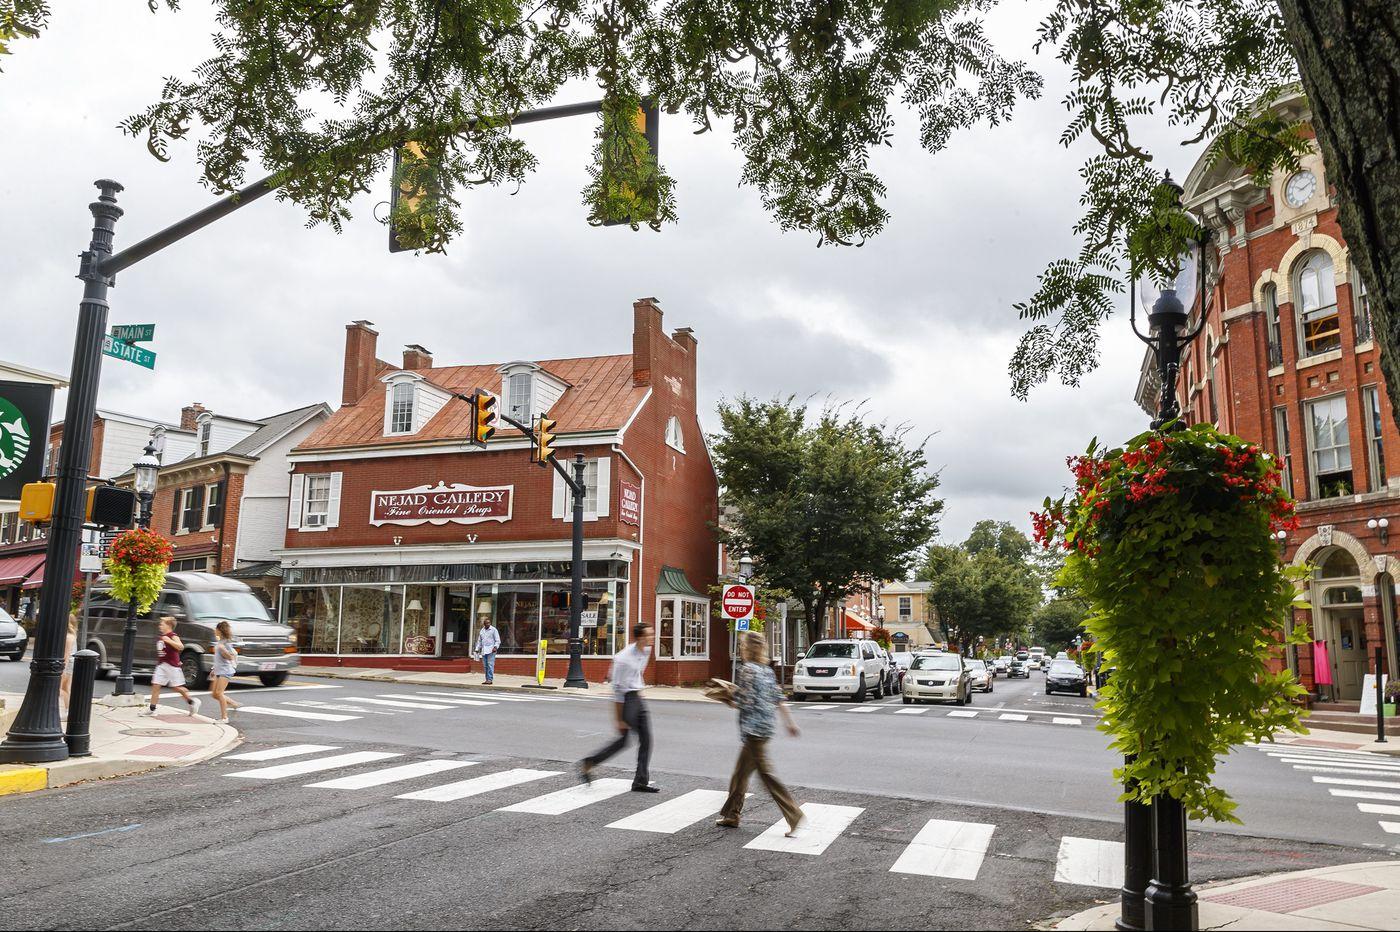 Tiny Doylestown Borough battled Verizon over 5G and won a big settlement